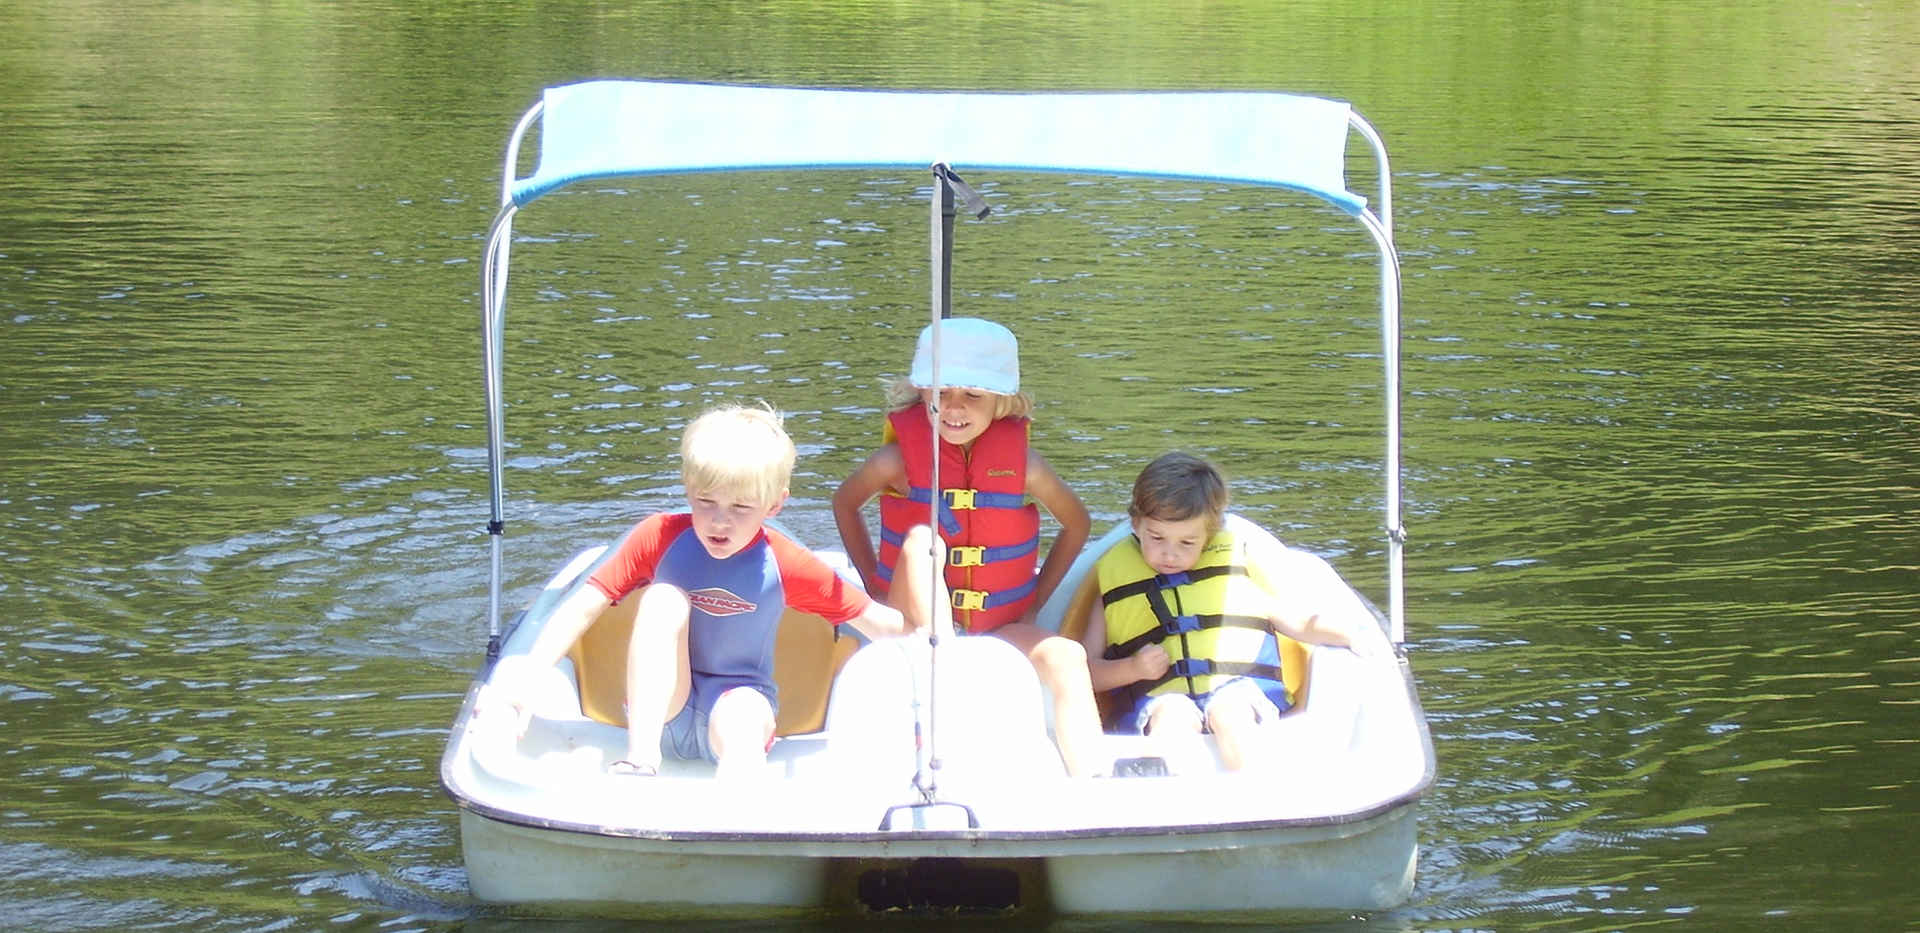 Poppy Lake - Paddle Boats